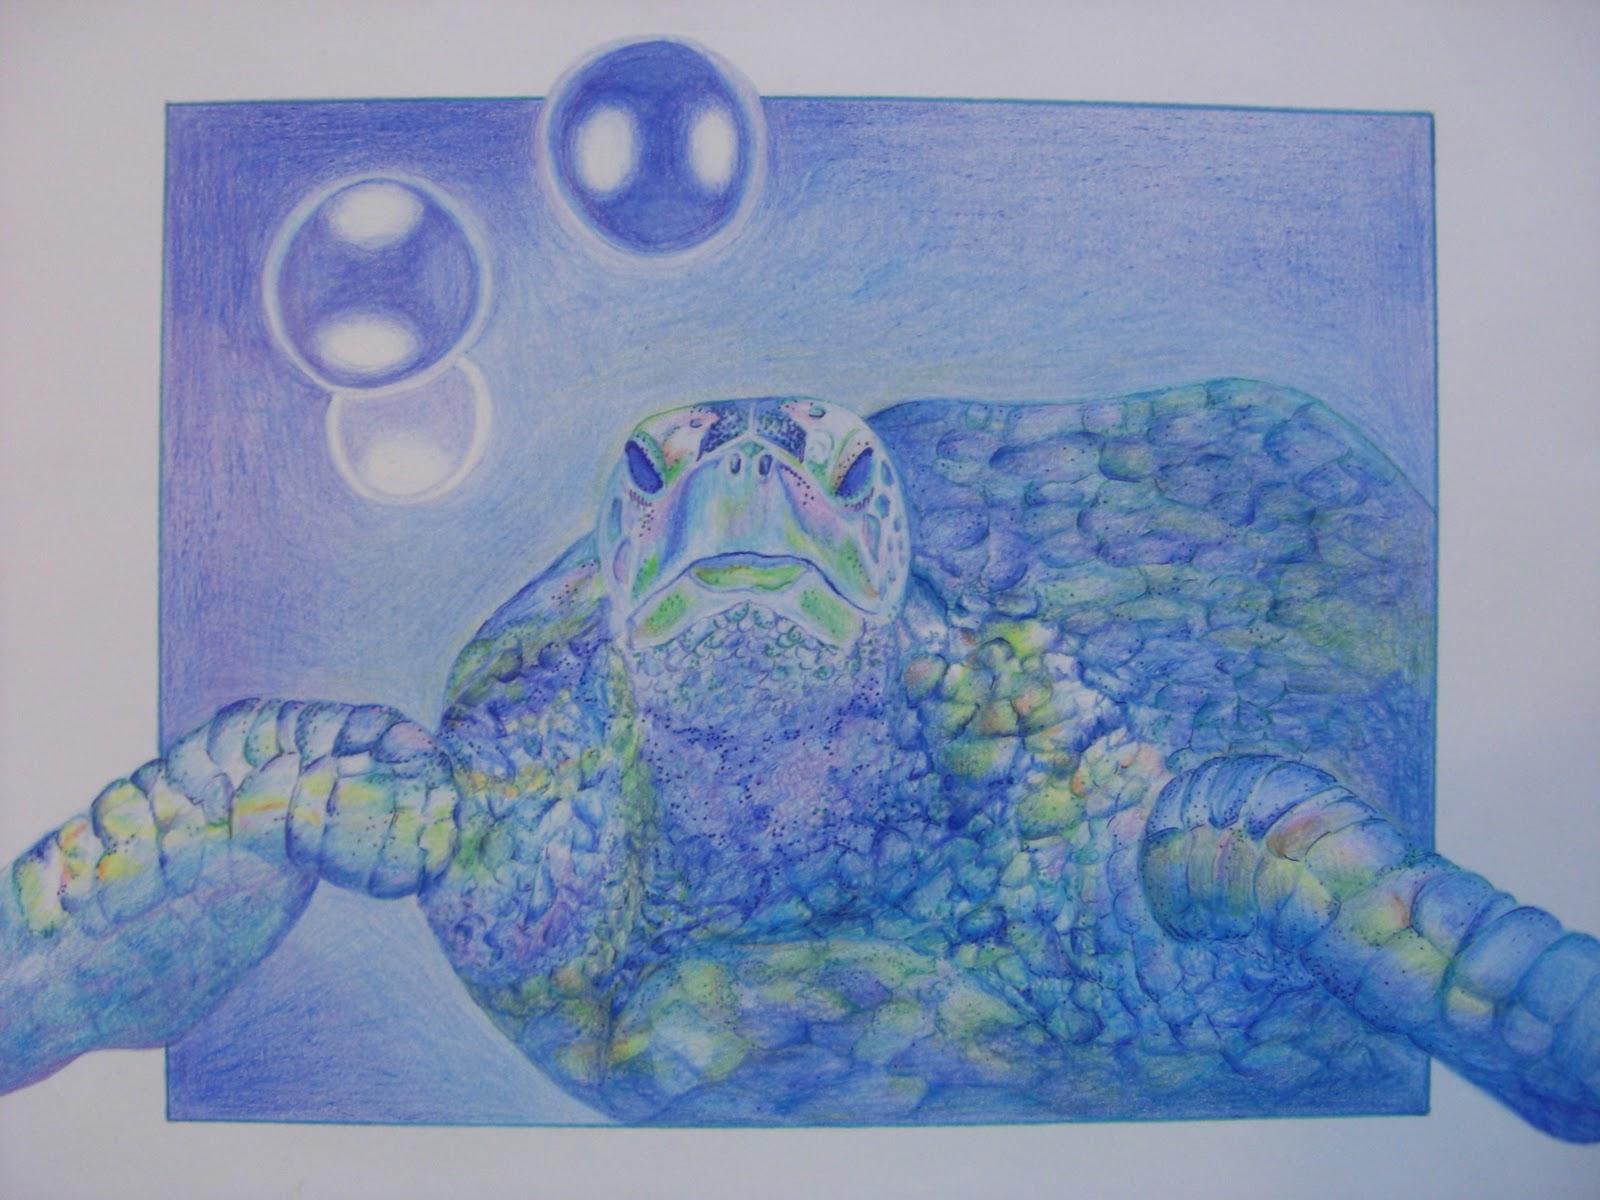 Ocean Themed Wallpaper Borders 1600x1200